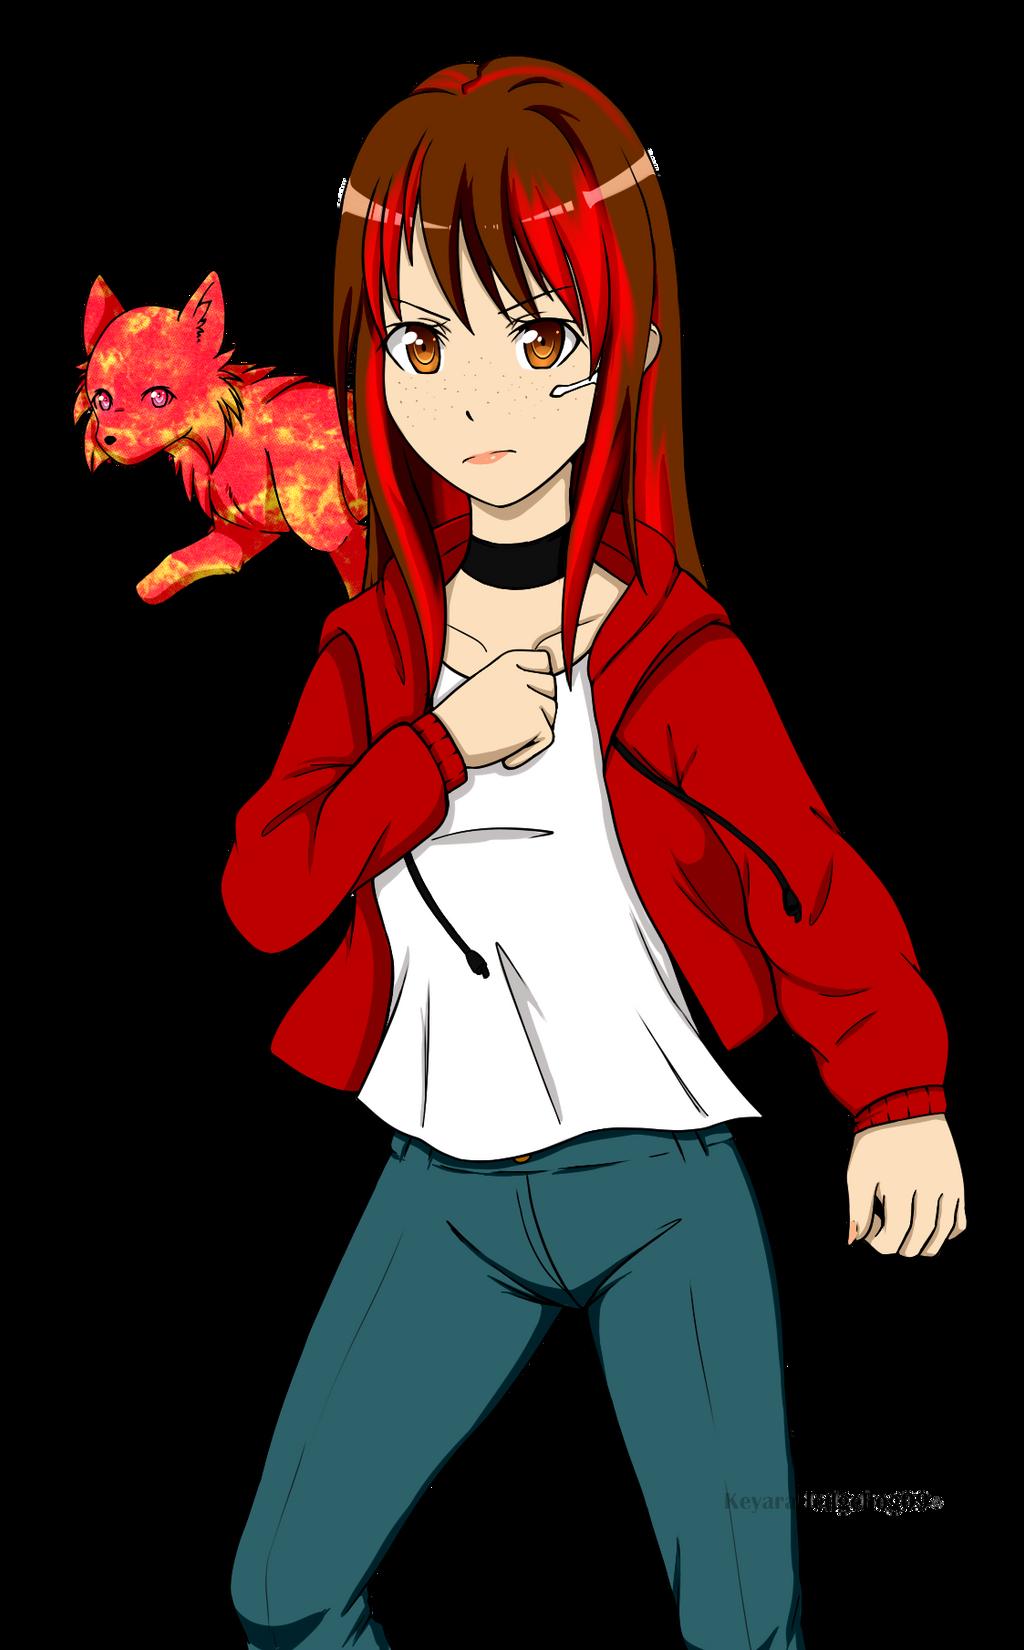 Style challenge - SAO  by KeyaraHedgehog09